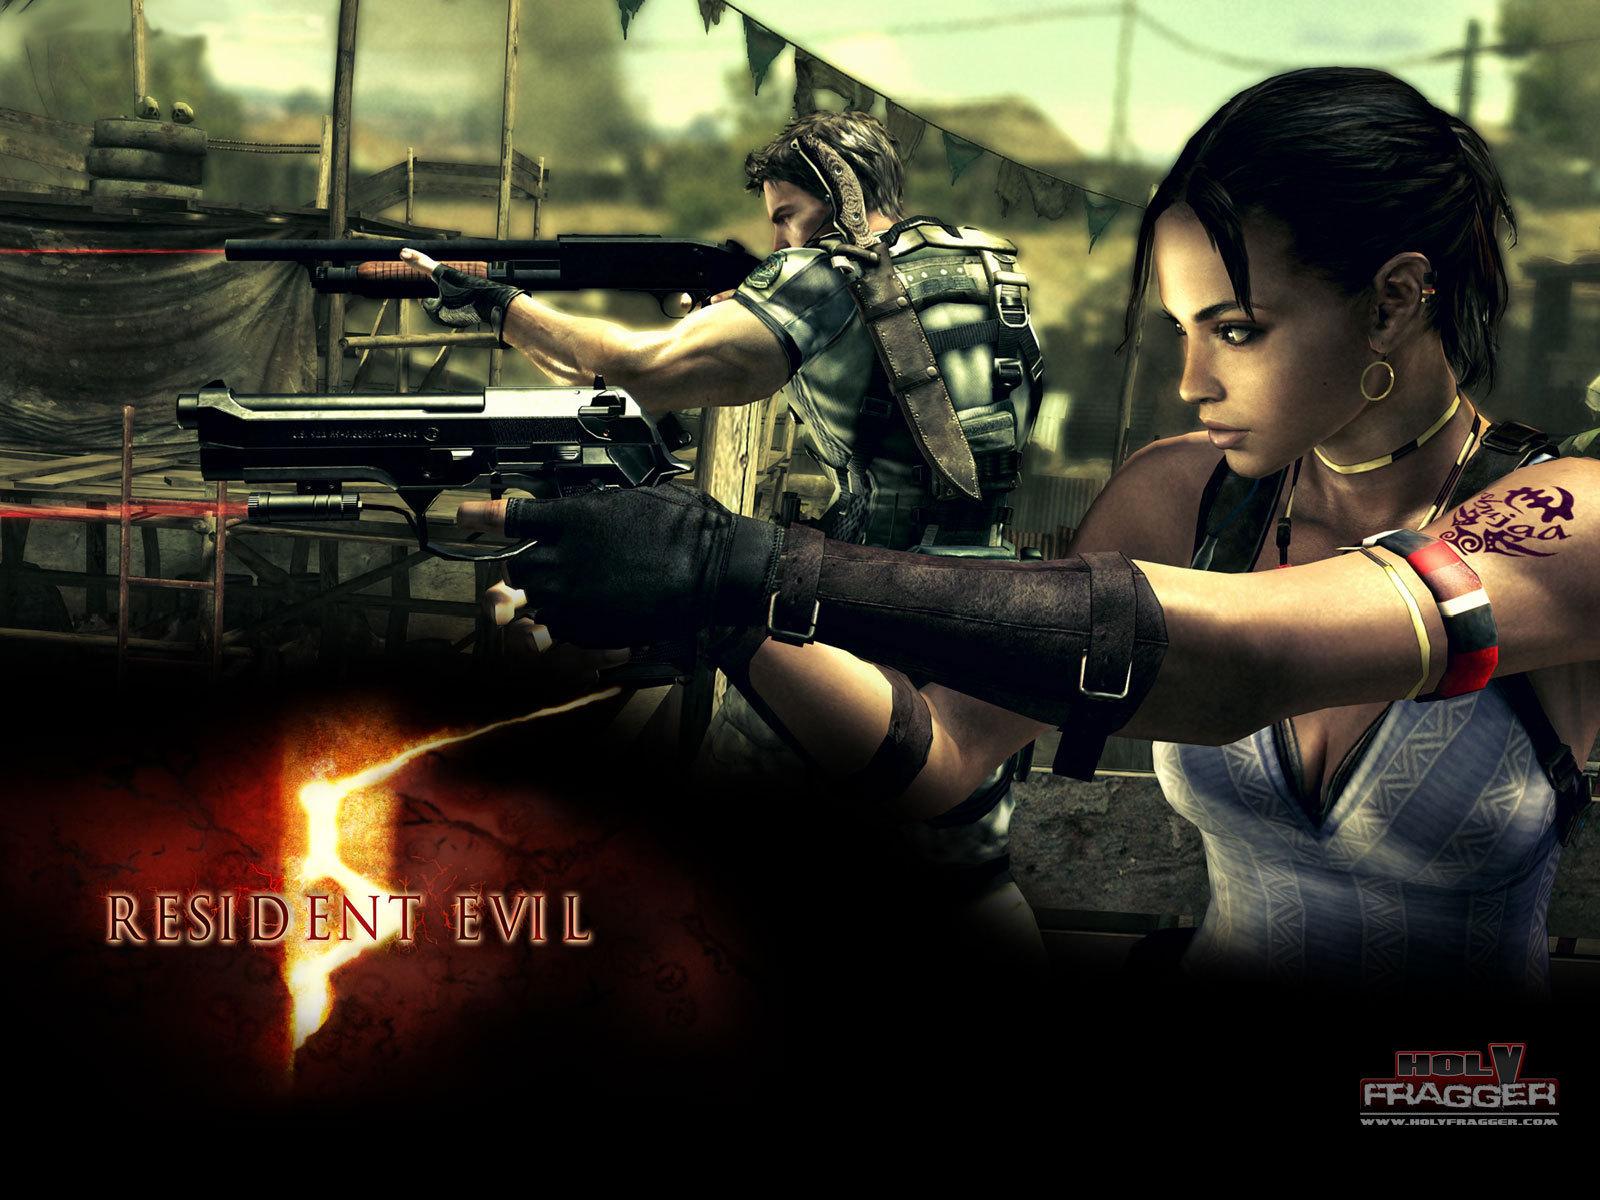 Resident evil 5 game trainer dx9 +15 trainer download.